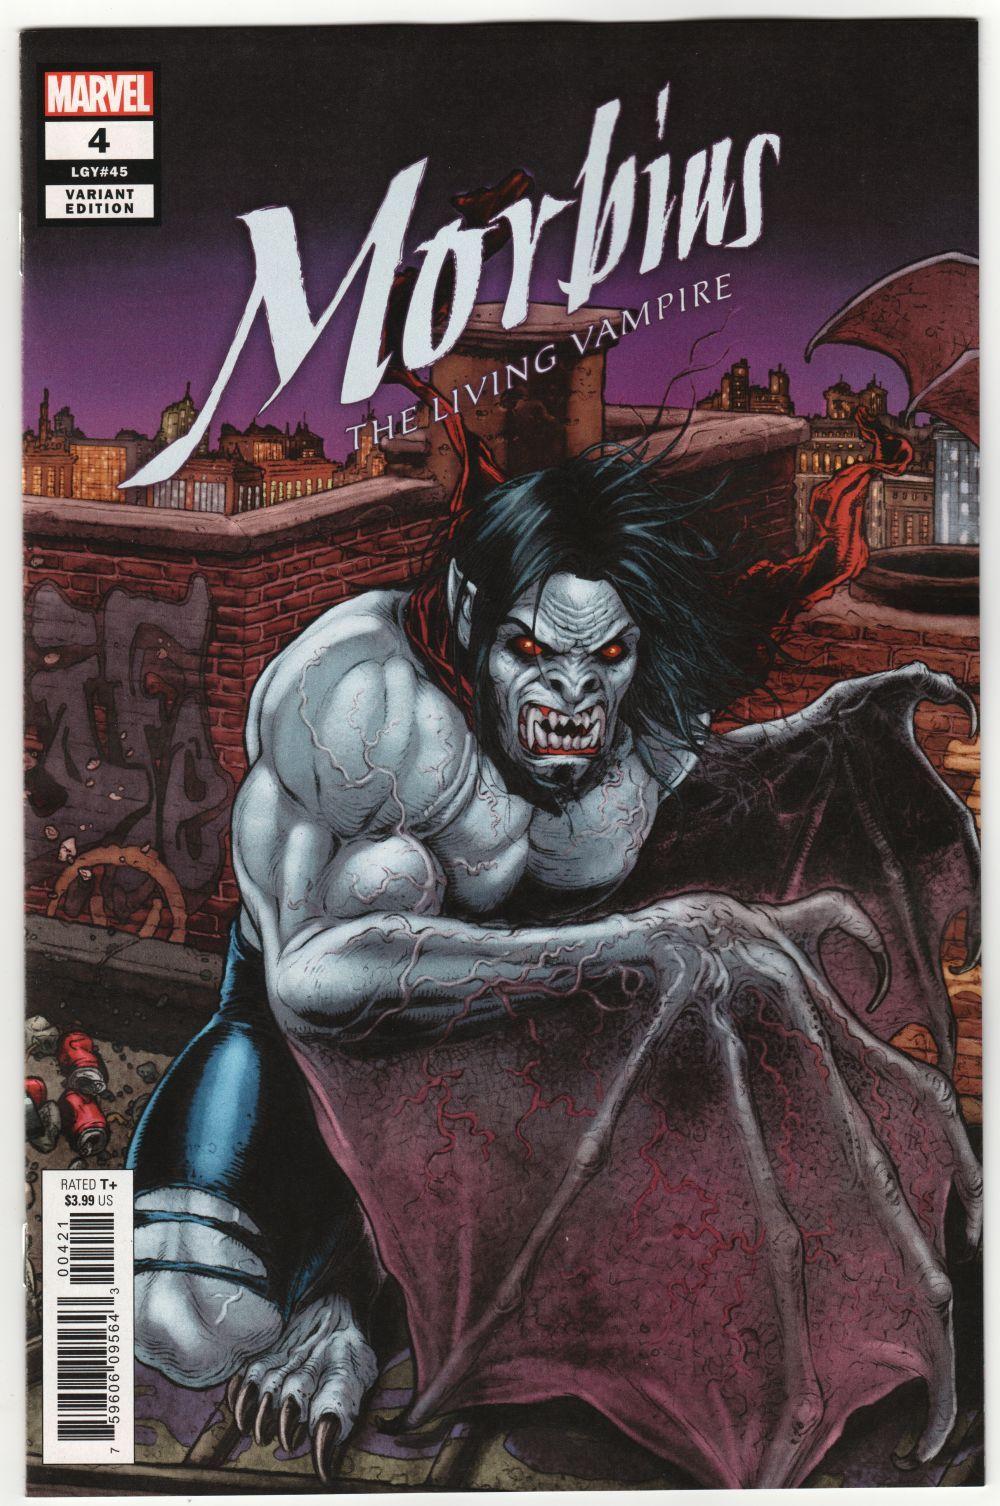 Marvel, 2020 NM Morbius #2 Ryp Connecting Variant